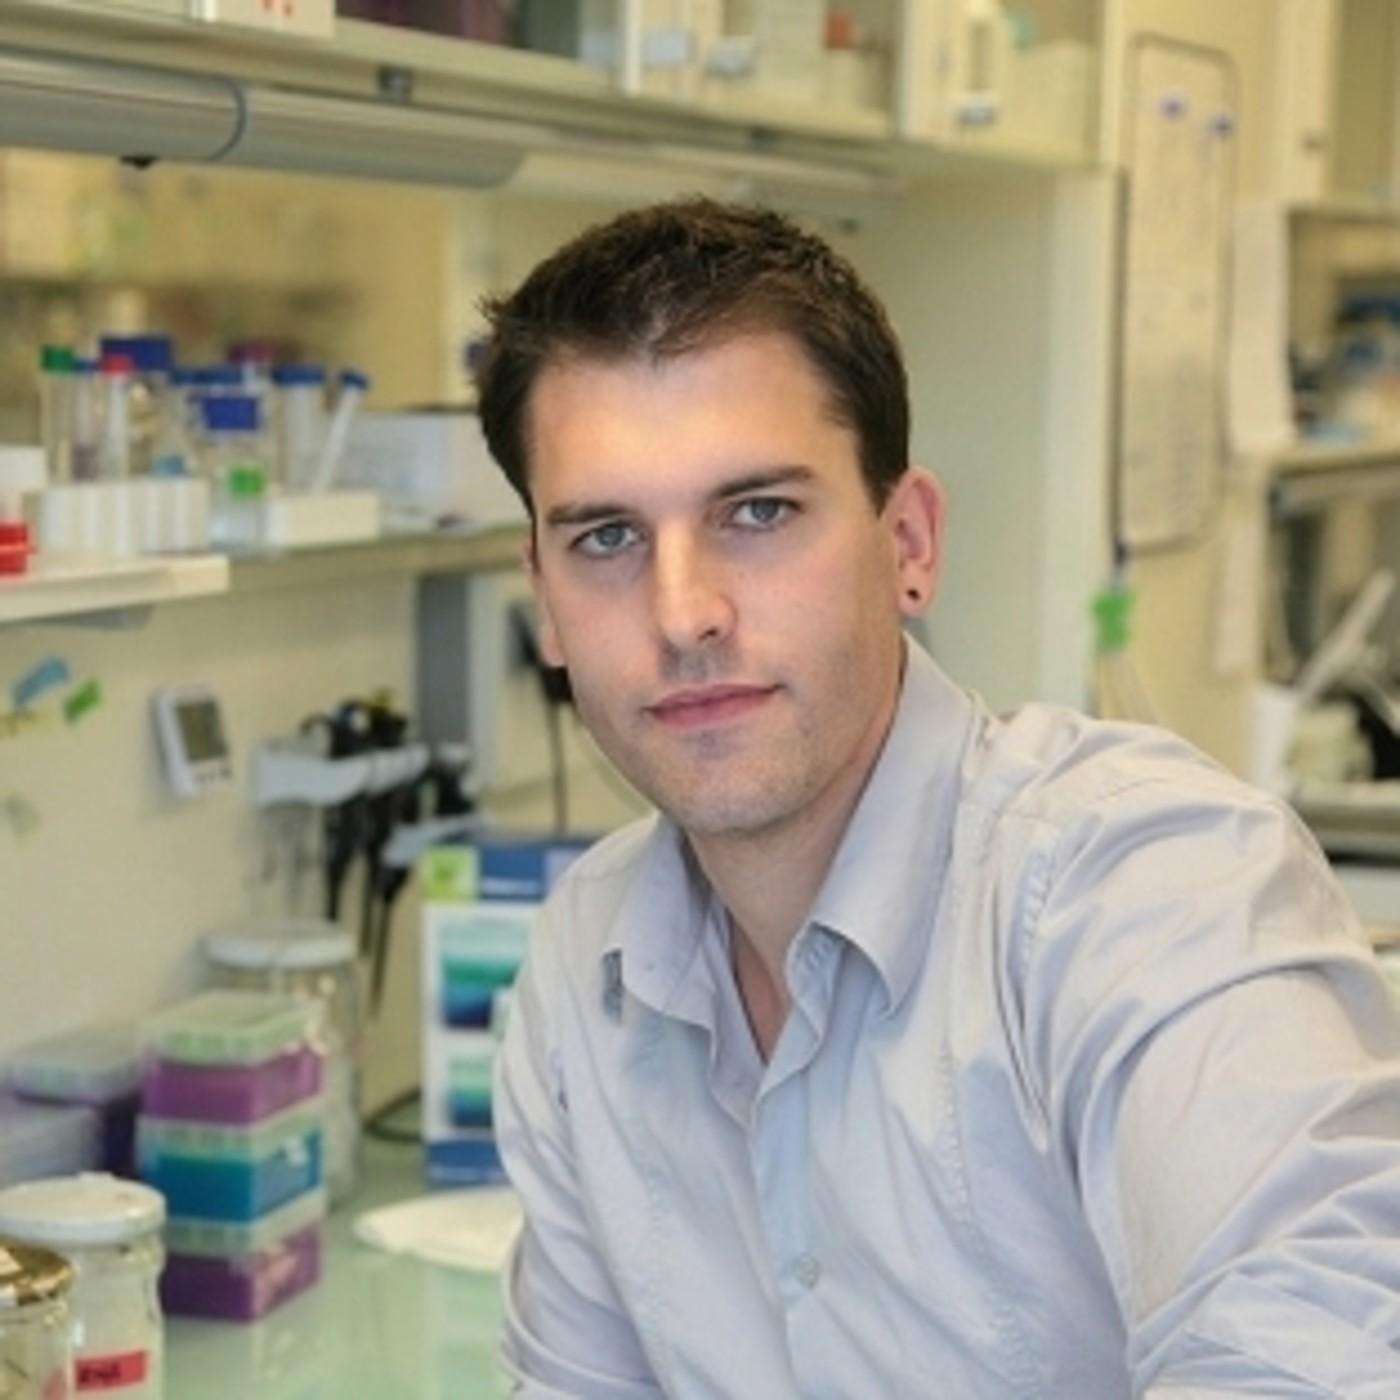 dr david perlmetter salud de la próstata